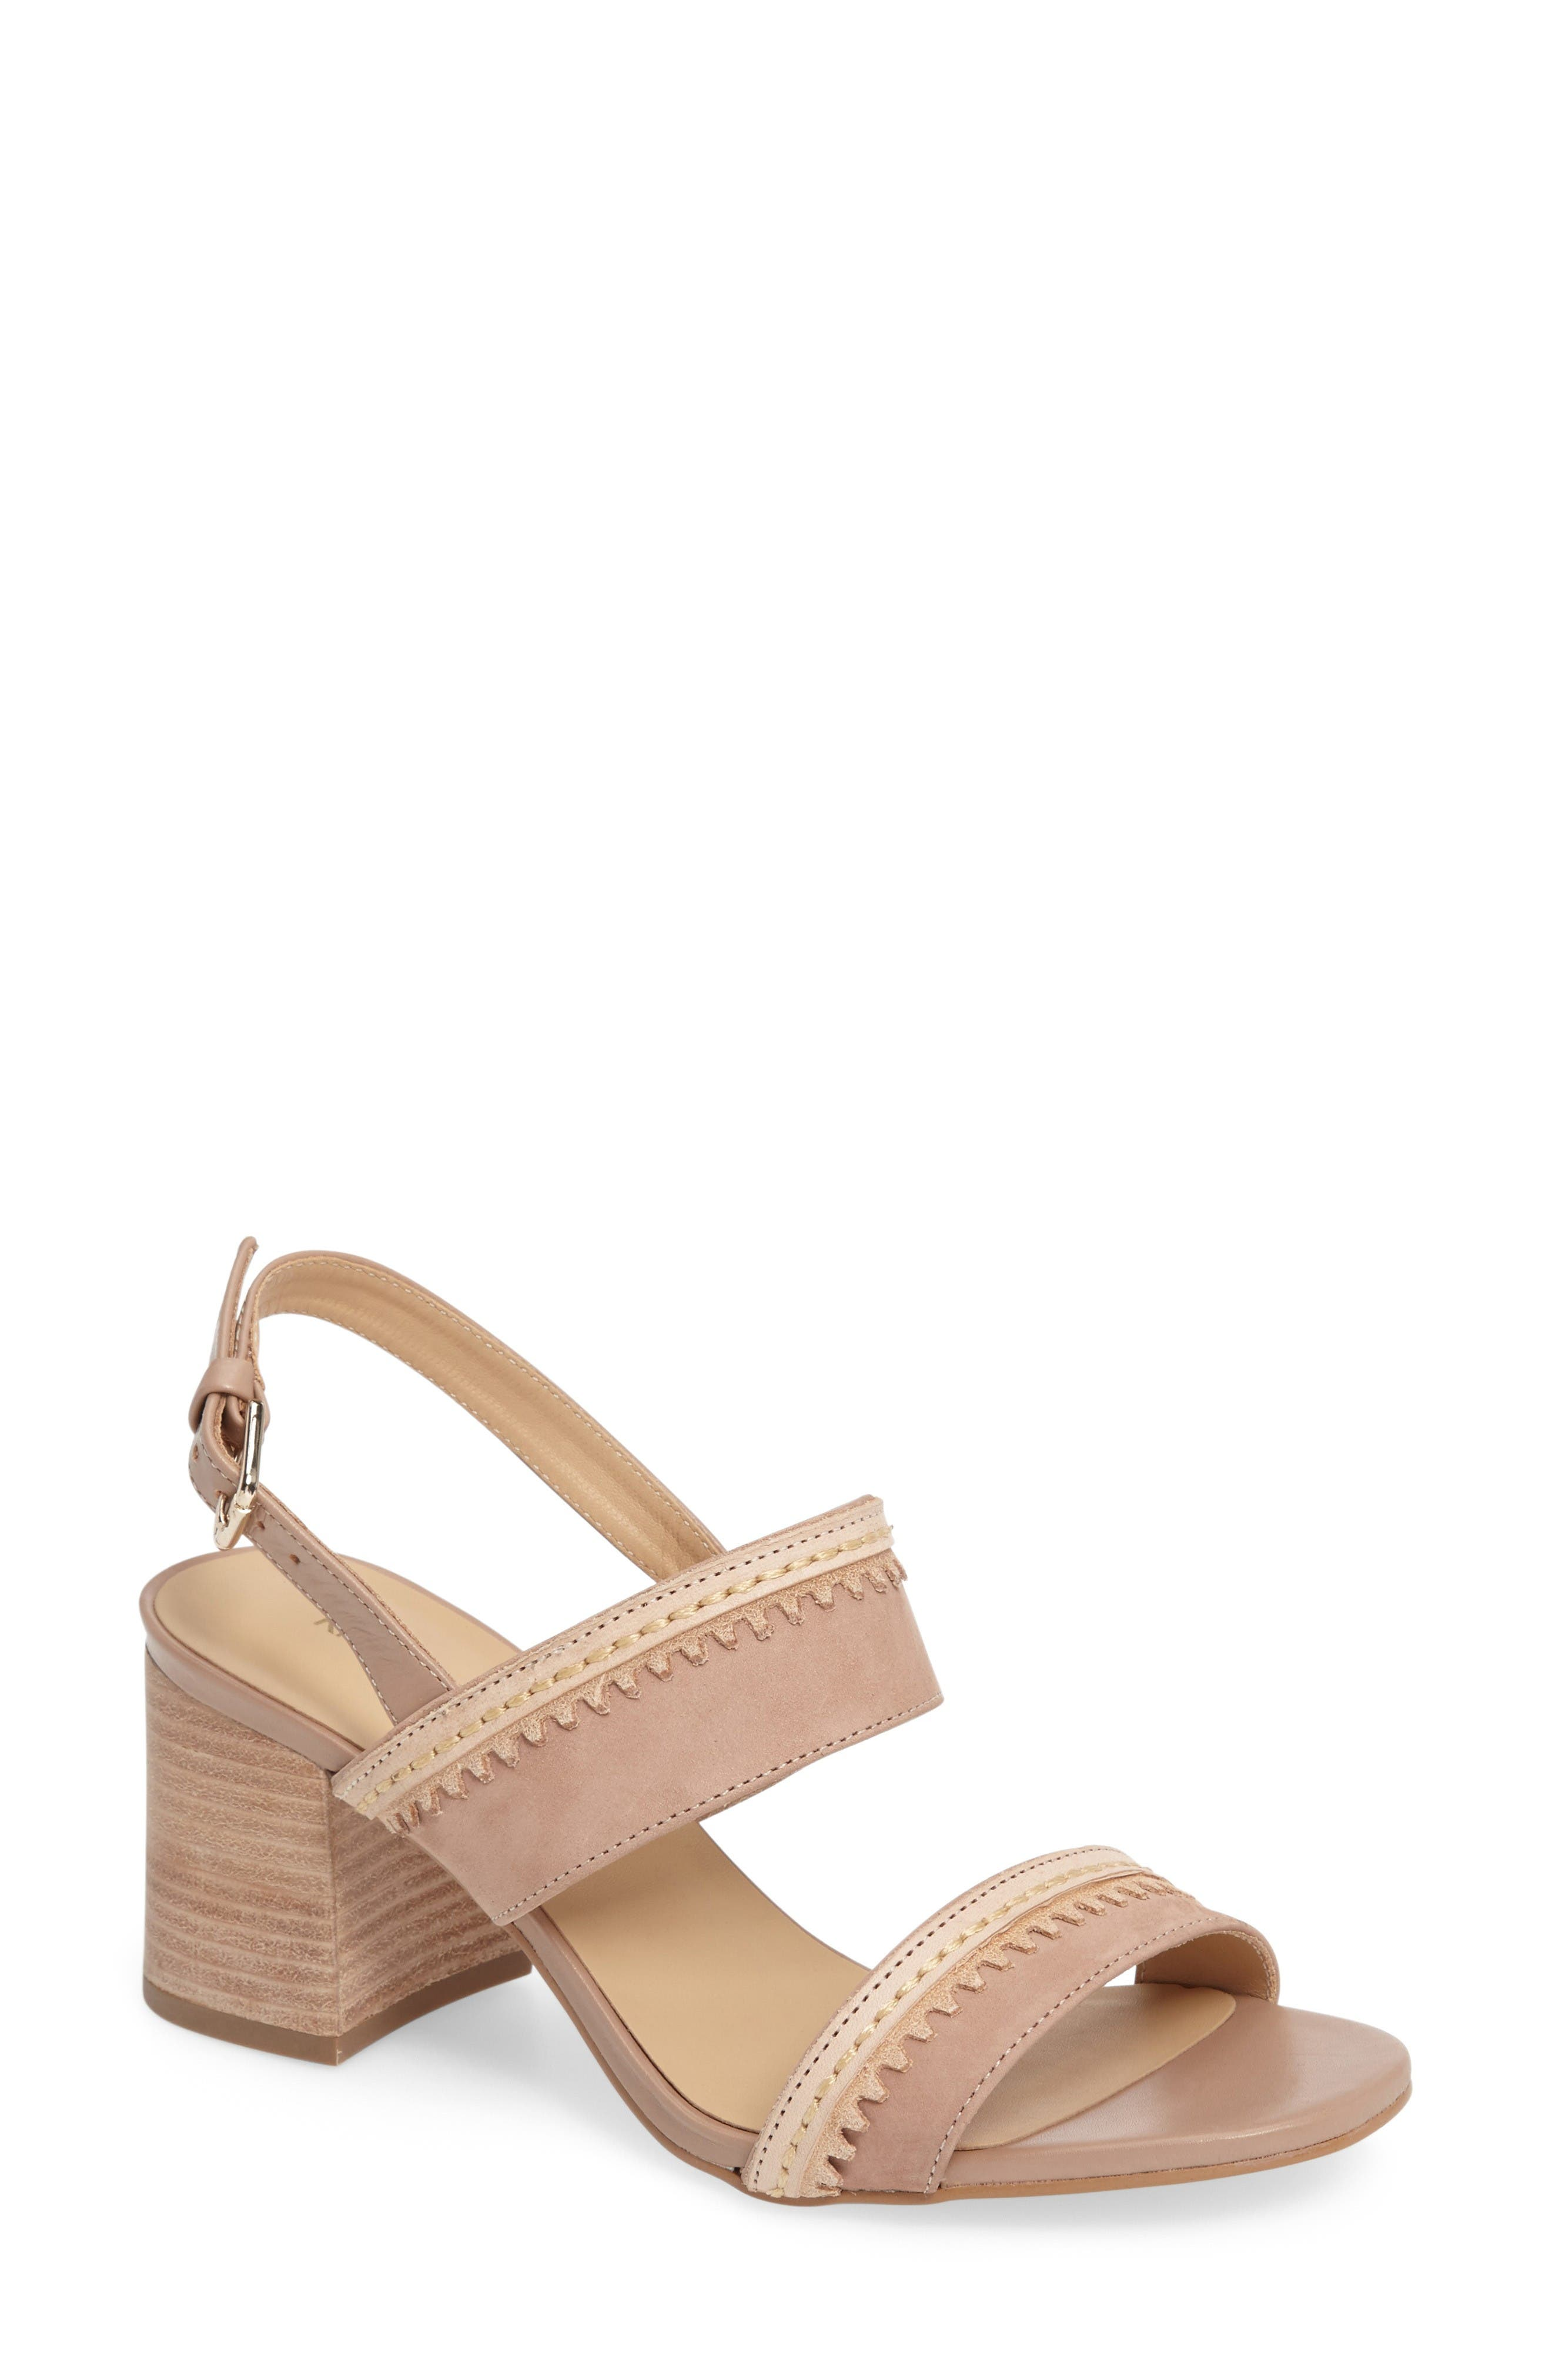 Rycca Block Heel Sandal,                         Main,                         color, Blush Leather